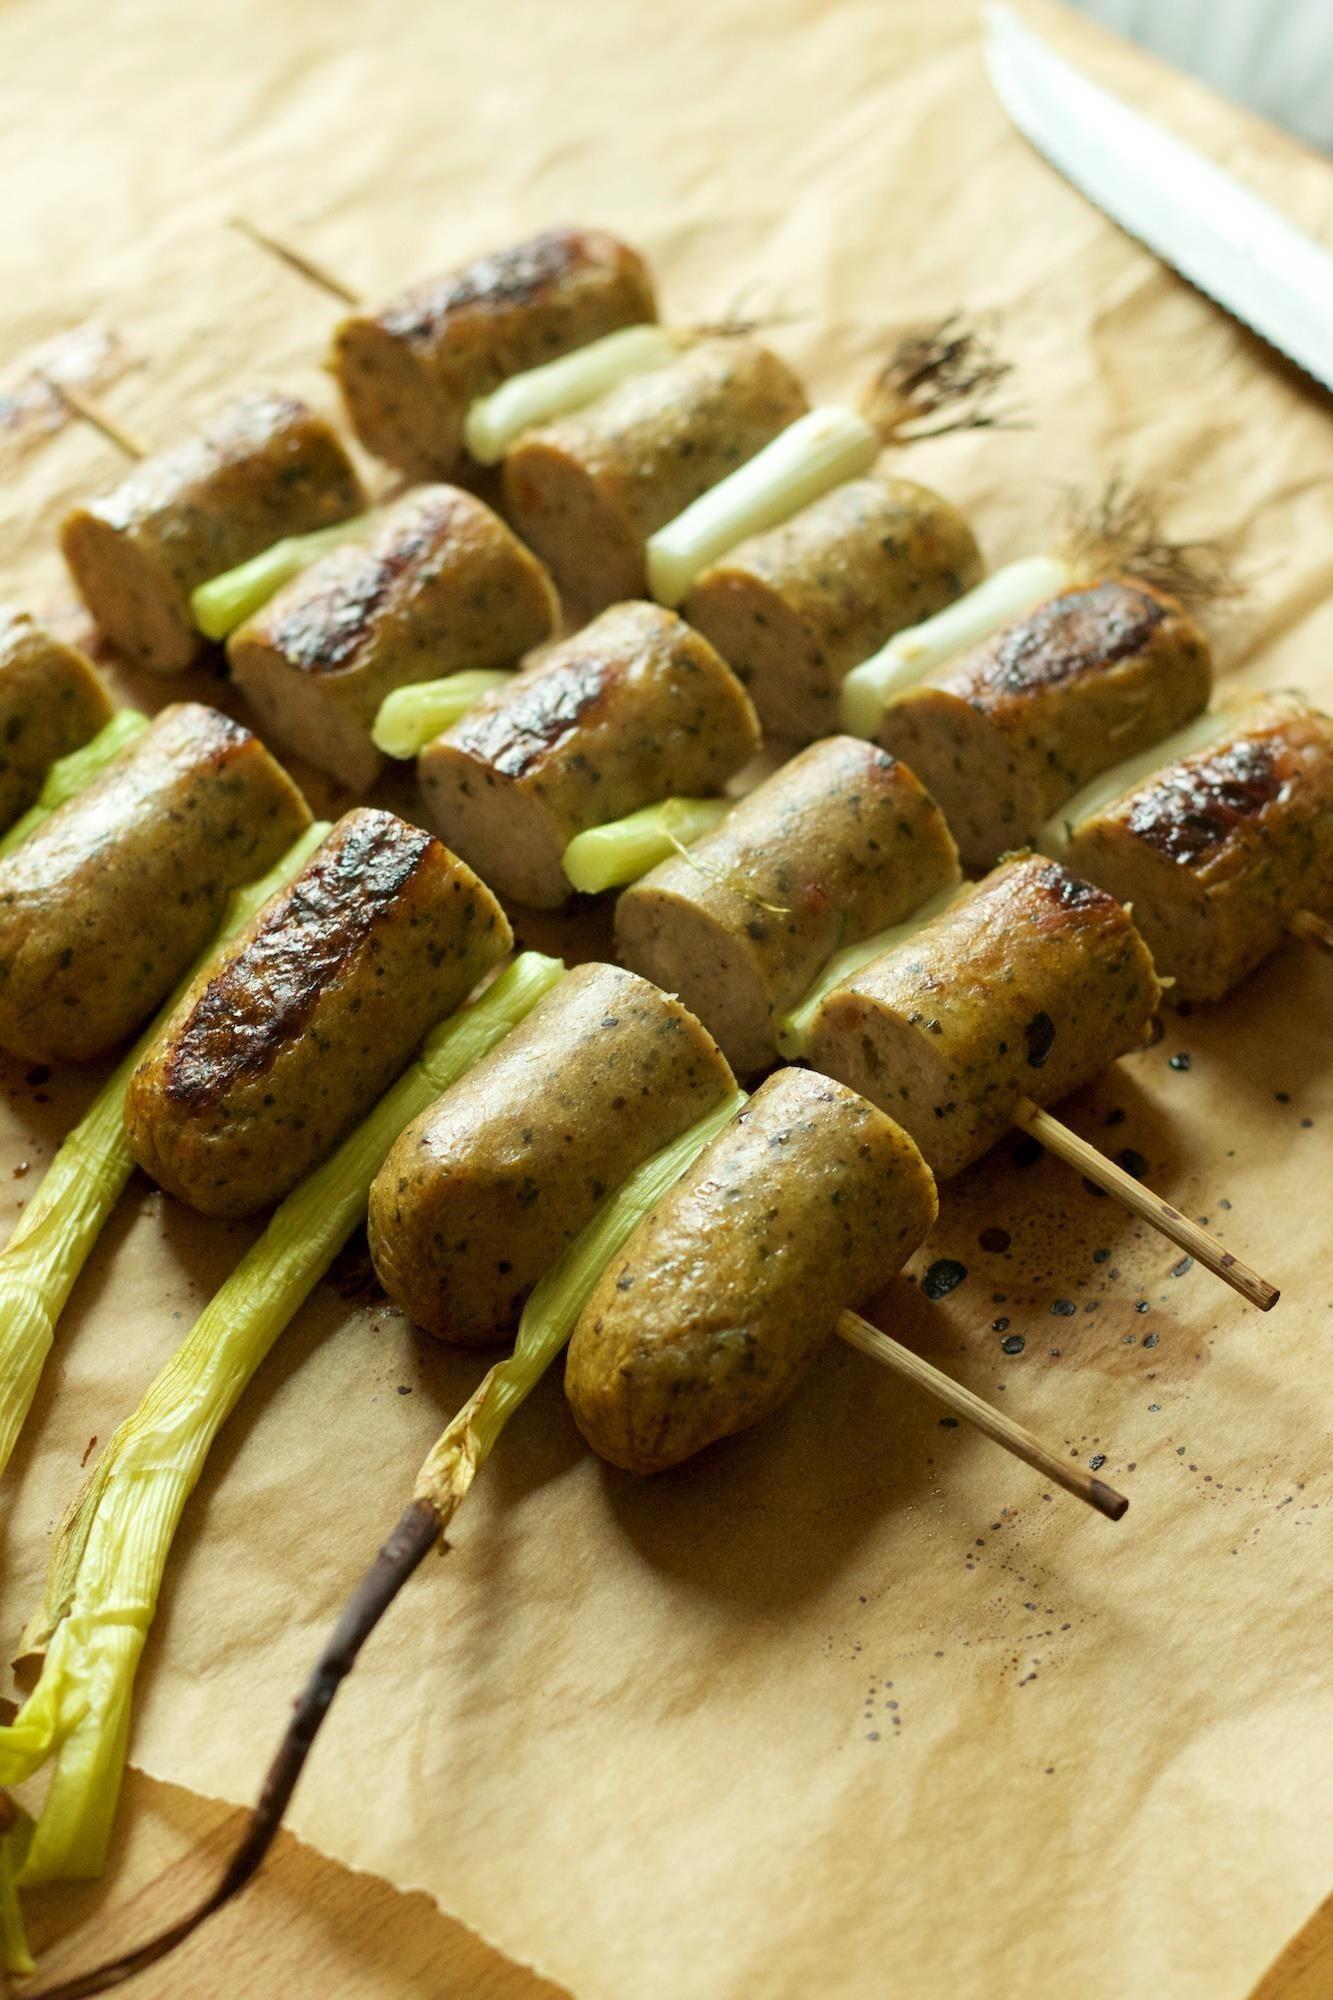 Skewer All Your Sausages Together for Easier Grilling